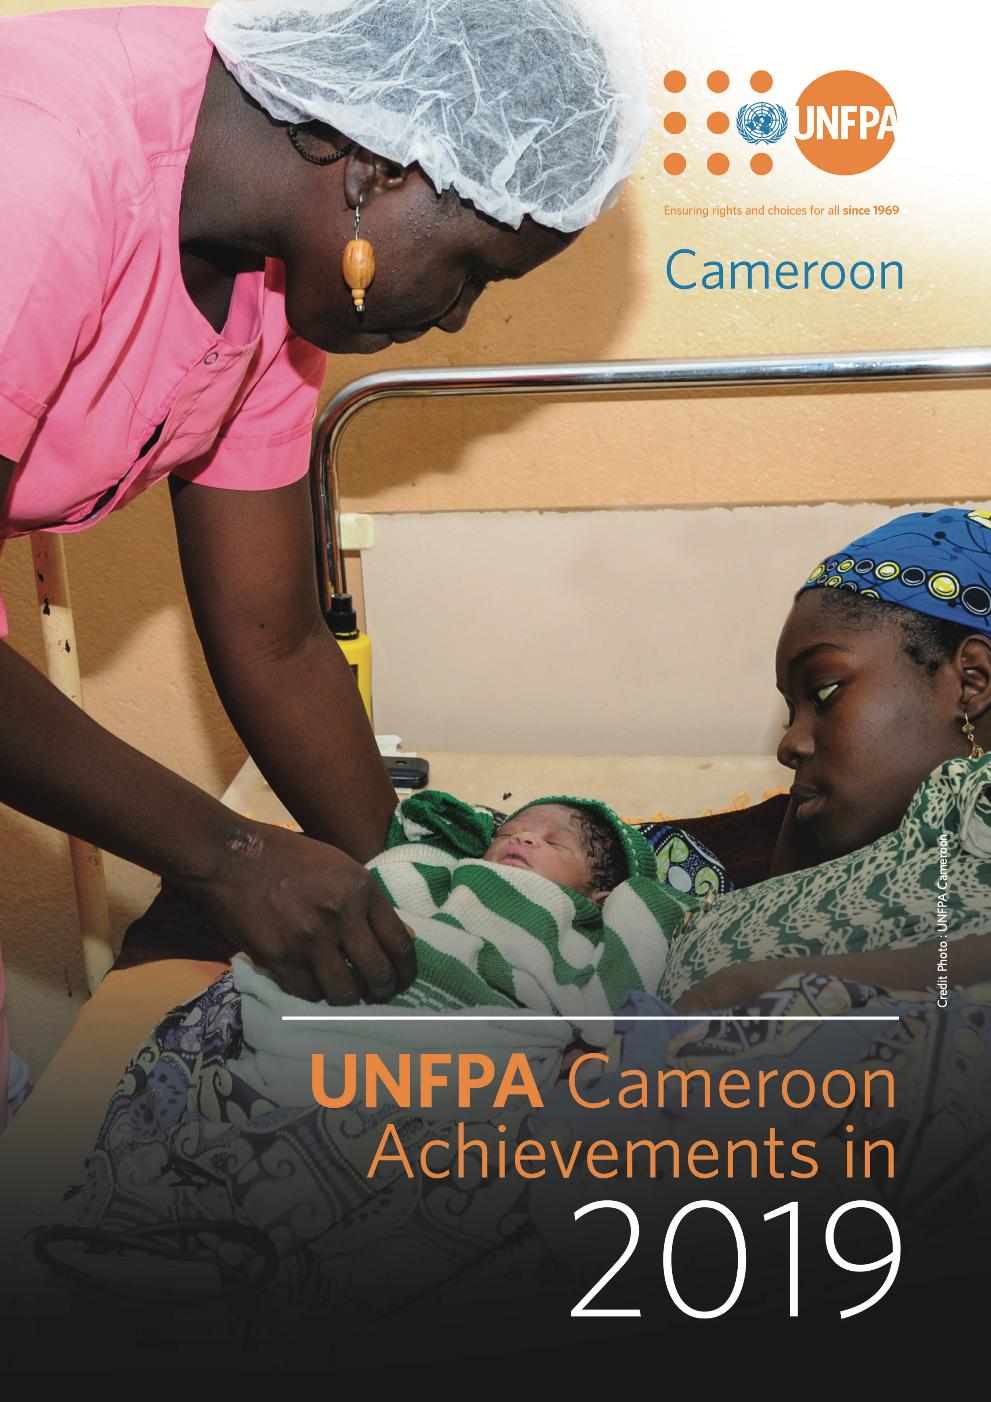 UNFPA Cameroon - Achievements in 2019